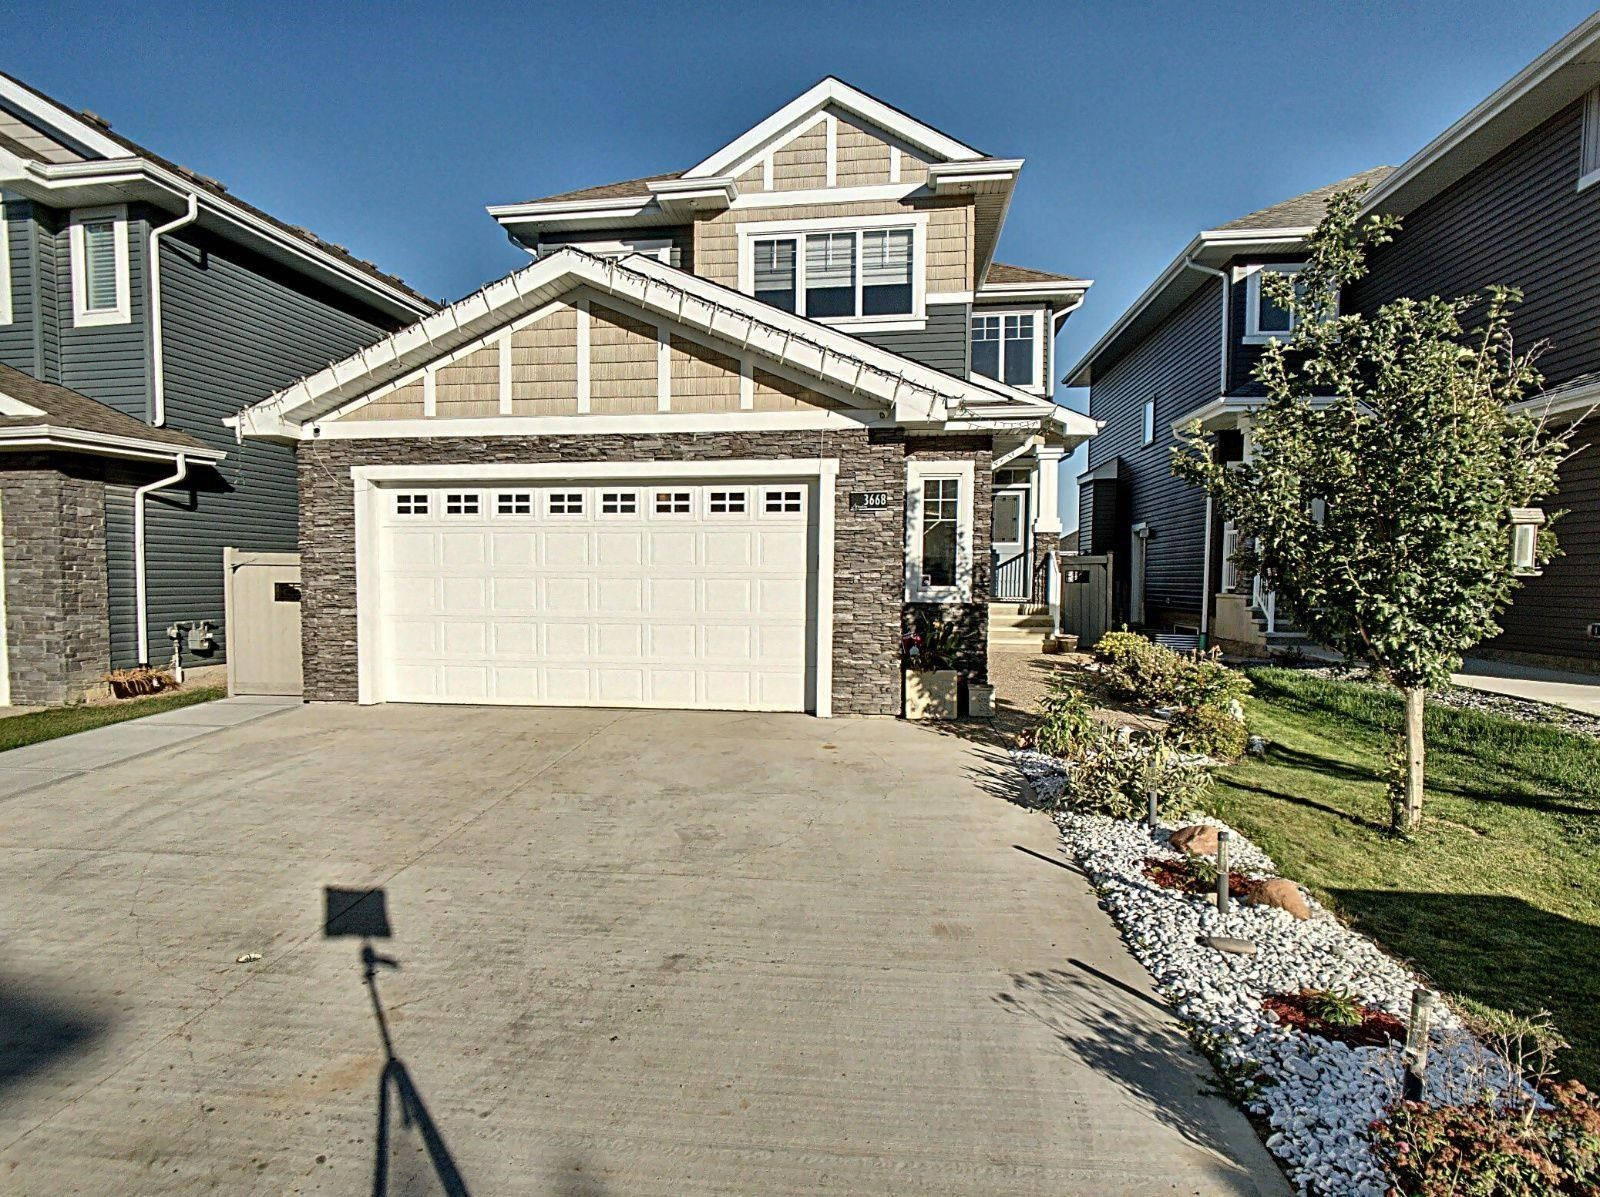 Main Photo: 3668 HUMMINGBIRD Way in Edmonton: Zone 59 House for sale : MLS®# E4262451